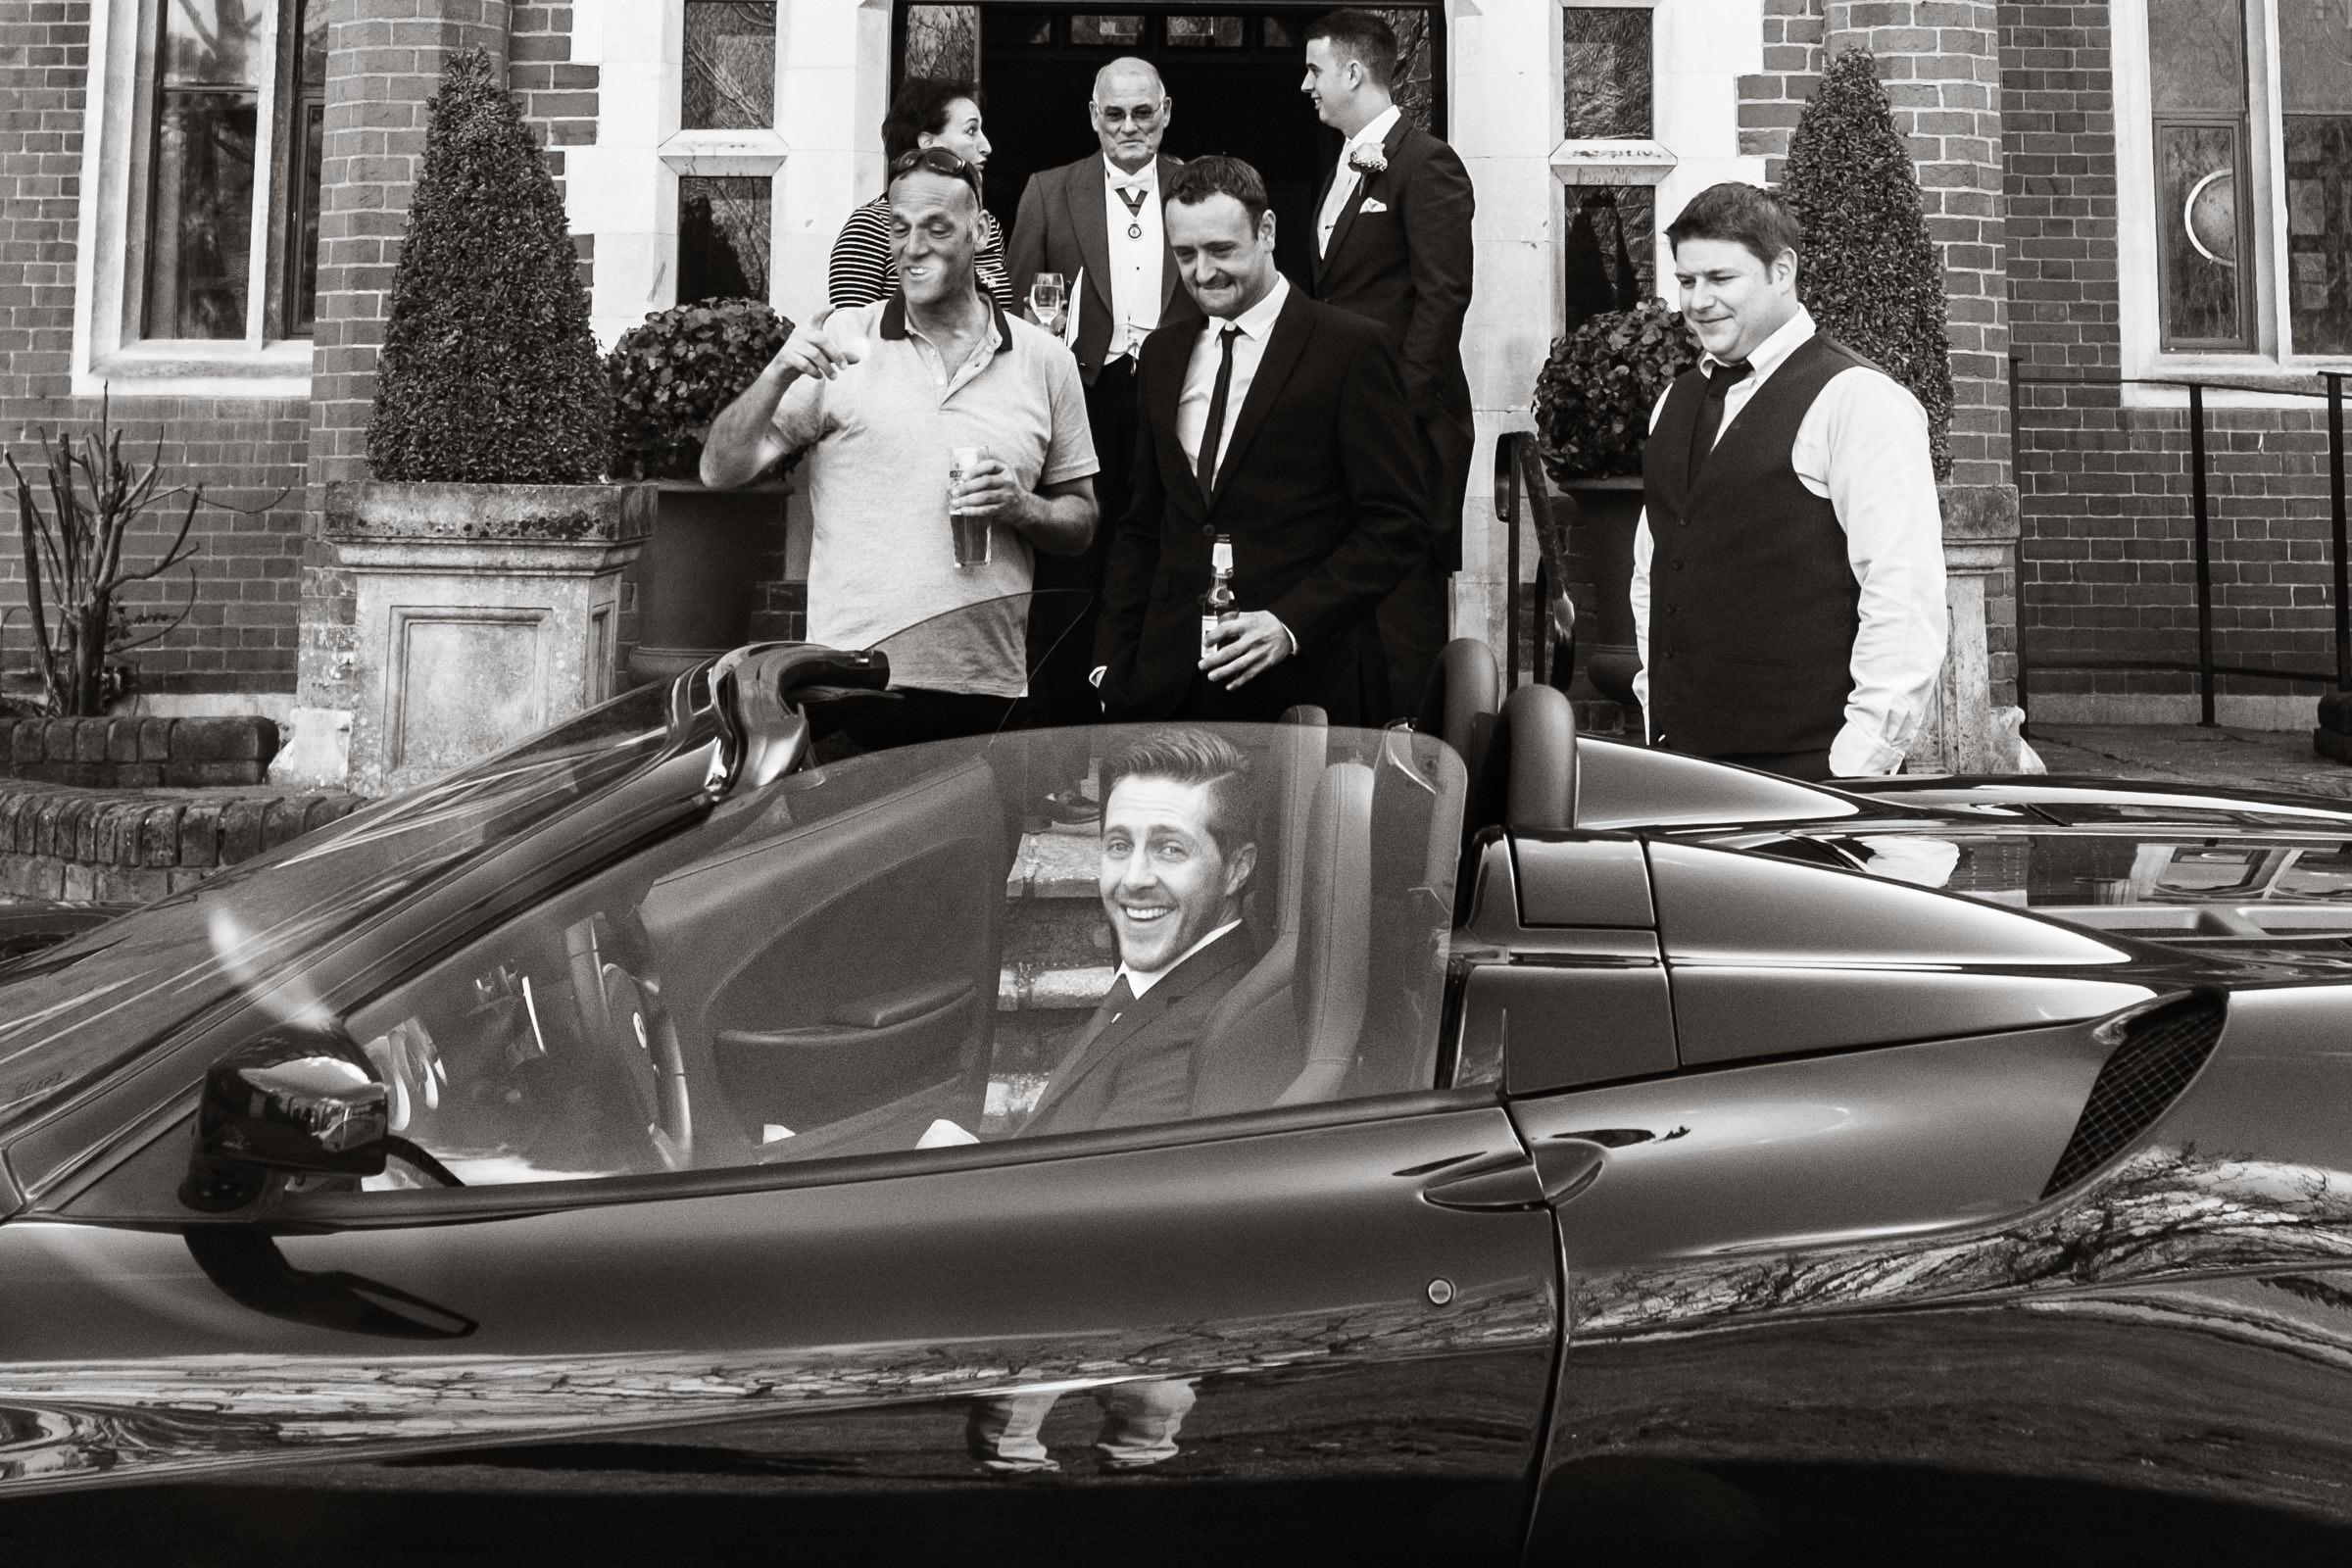 Donna & Nick's Wedding at Wotton House in Dorking 003.jpg